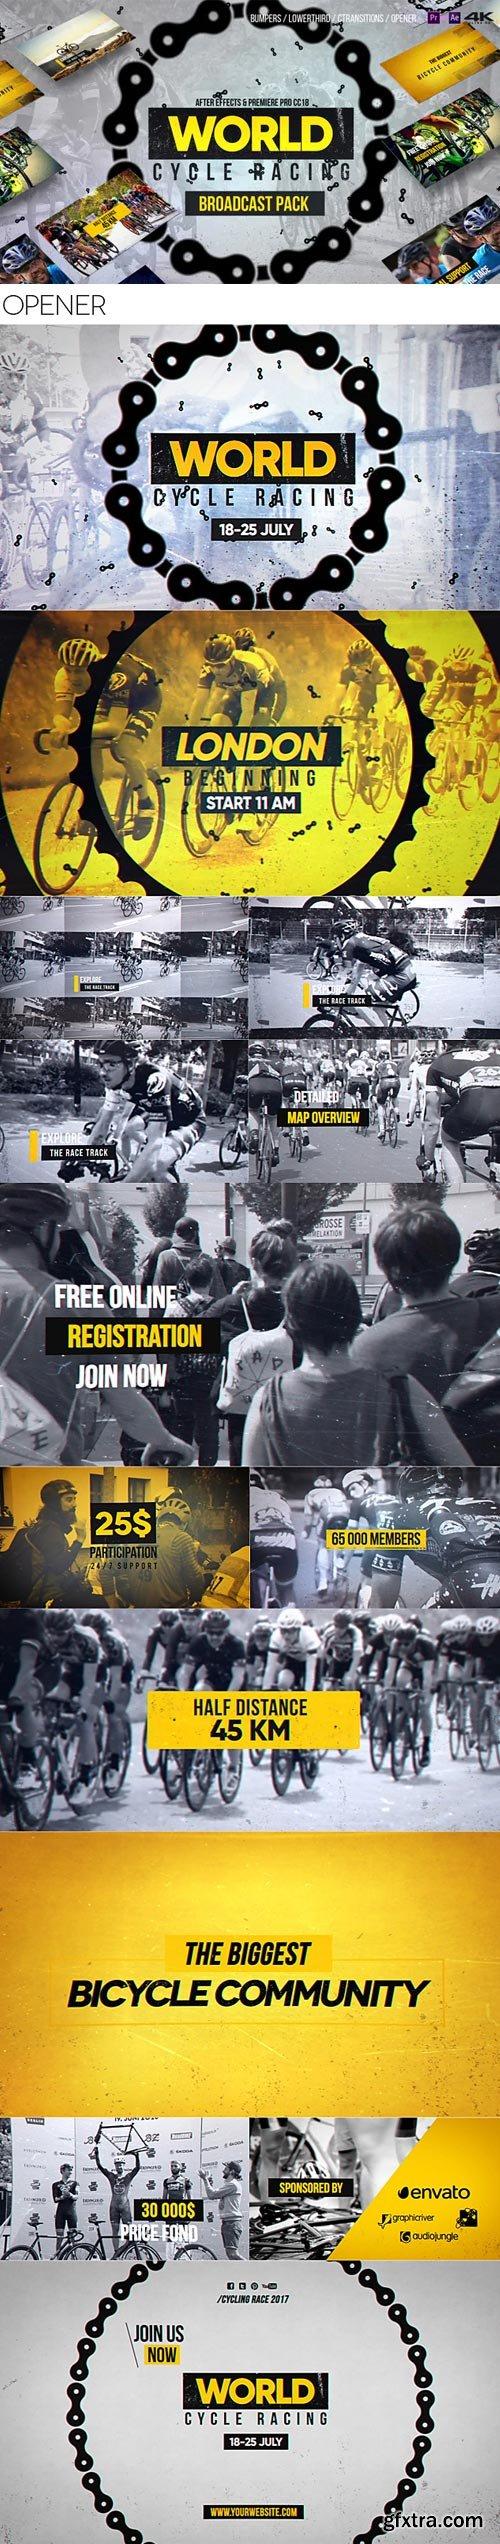 Videohive - World Cycling Marathon Pack - 20086604